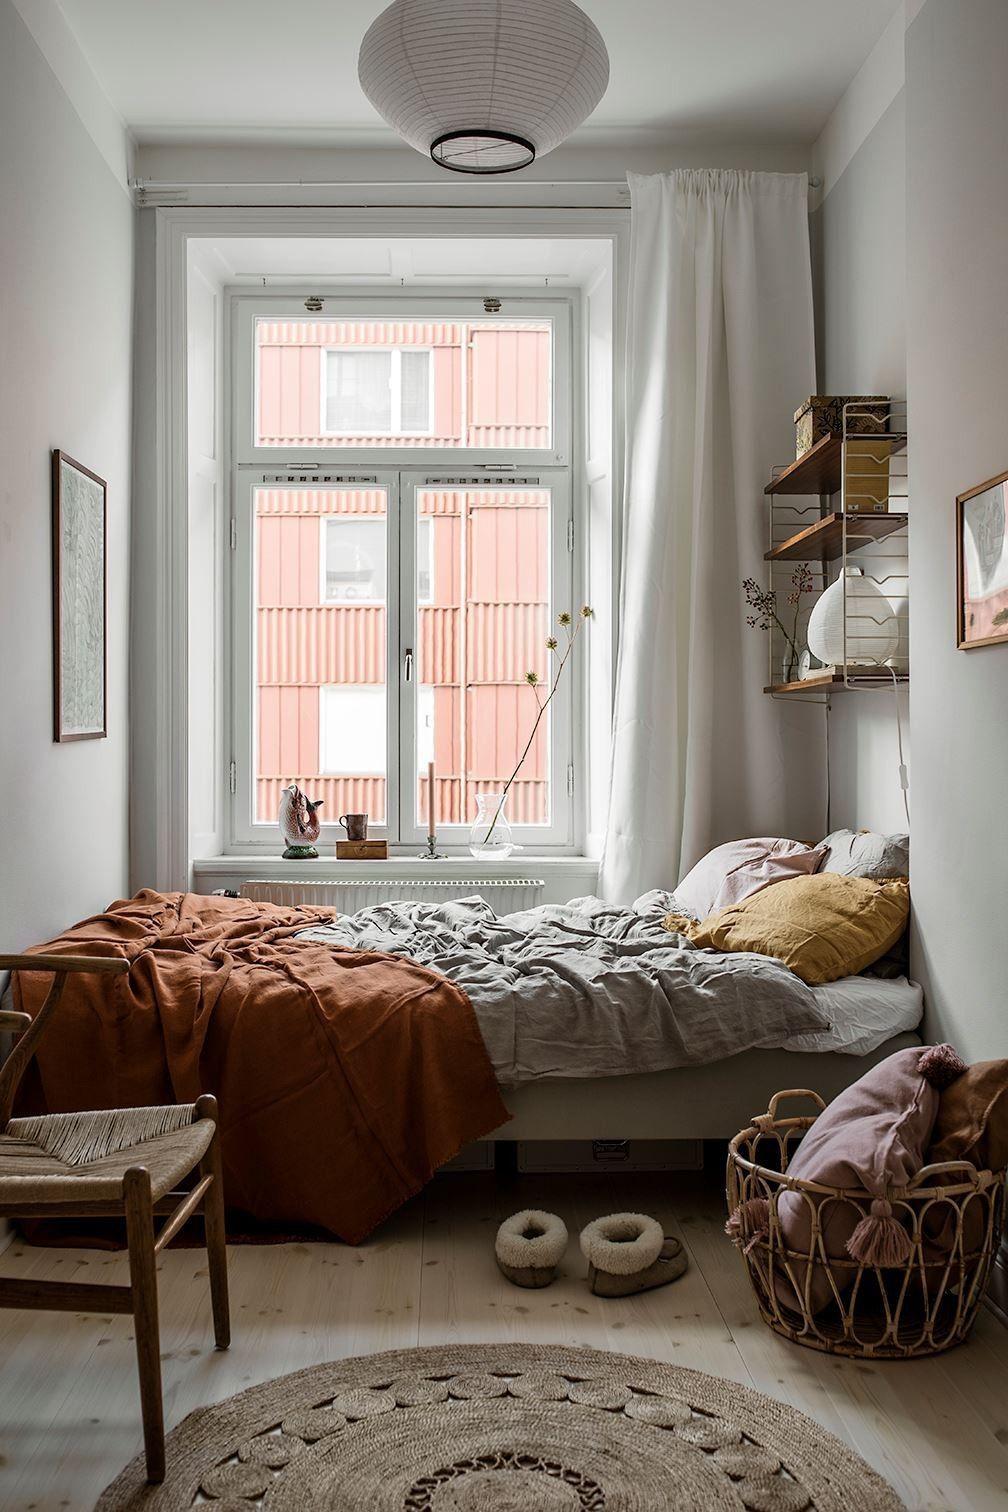 Brookepaigem In 2020 Aesthetic Room Decor Home Decor Bedroom